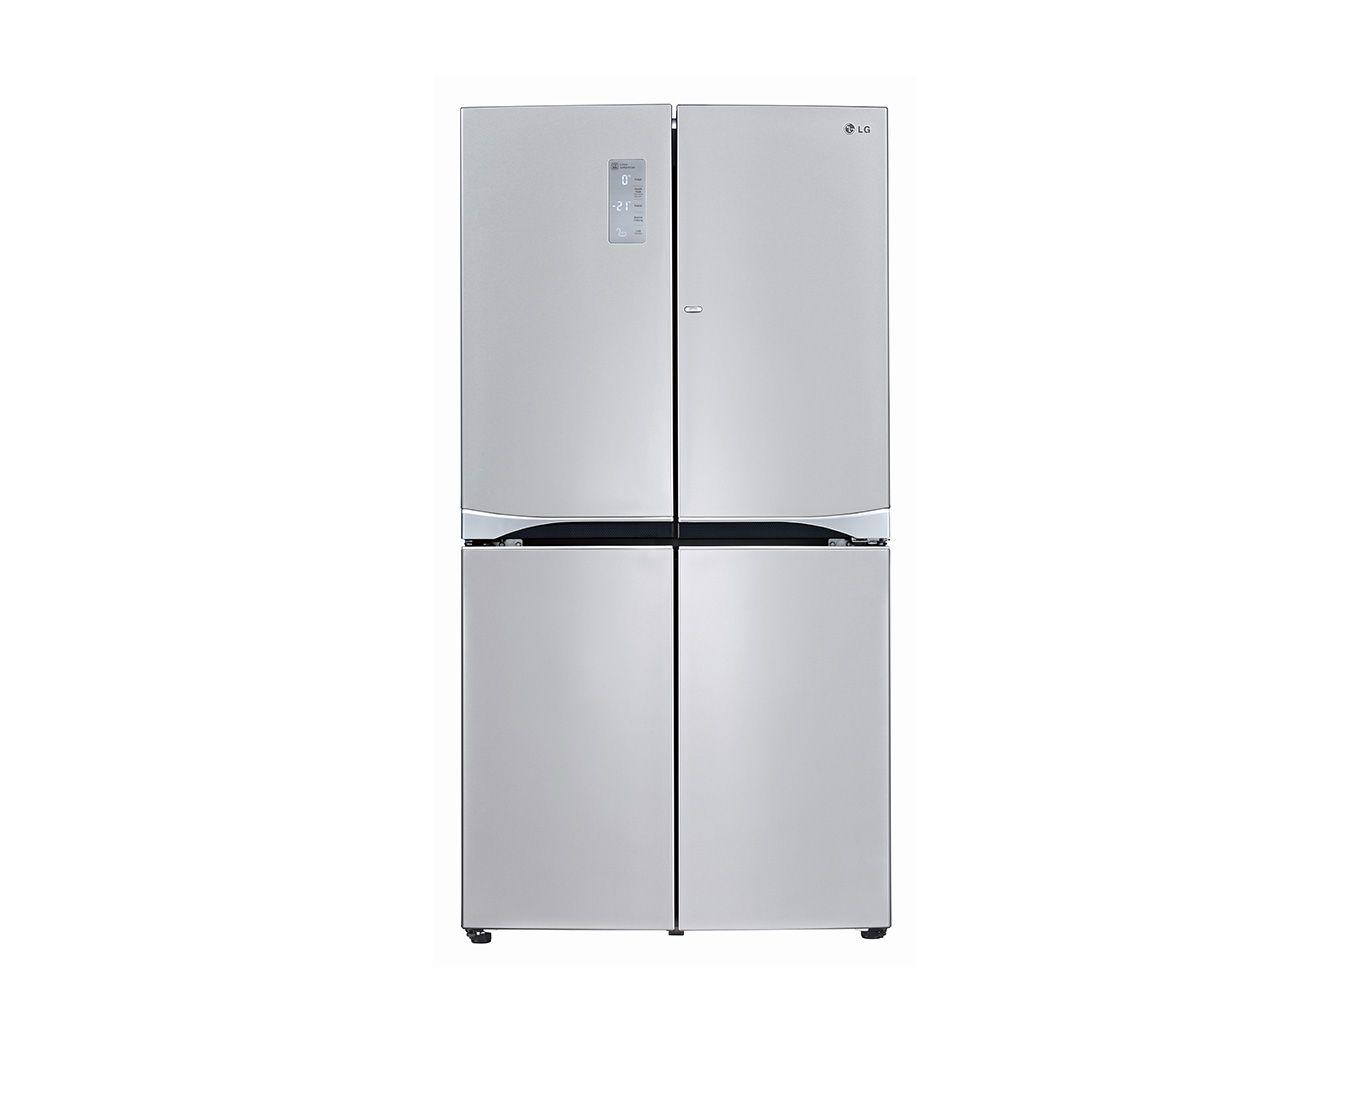 LG GMM916NSHV Side-by-Side-Kühlschrank | Gadgets und Zeugs | Pinterest